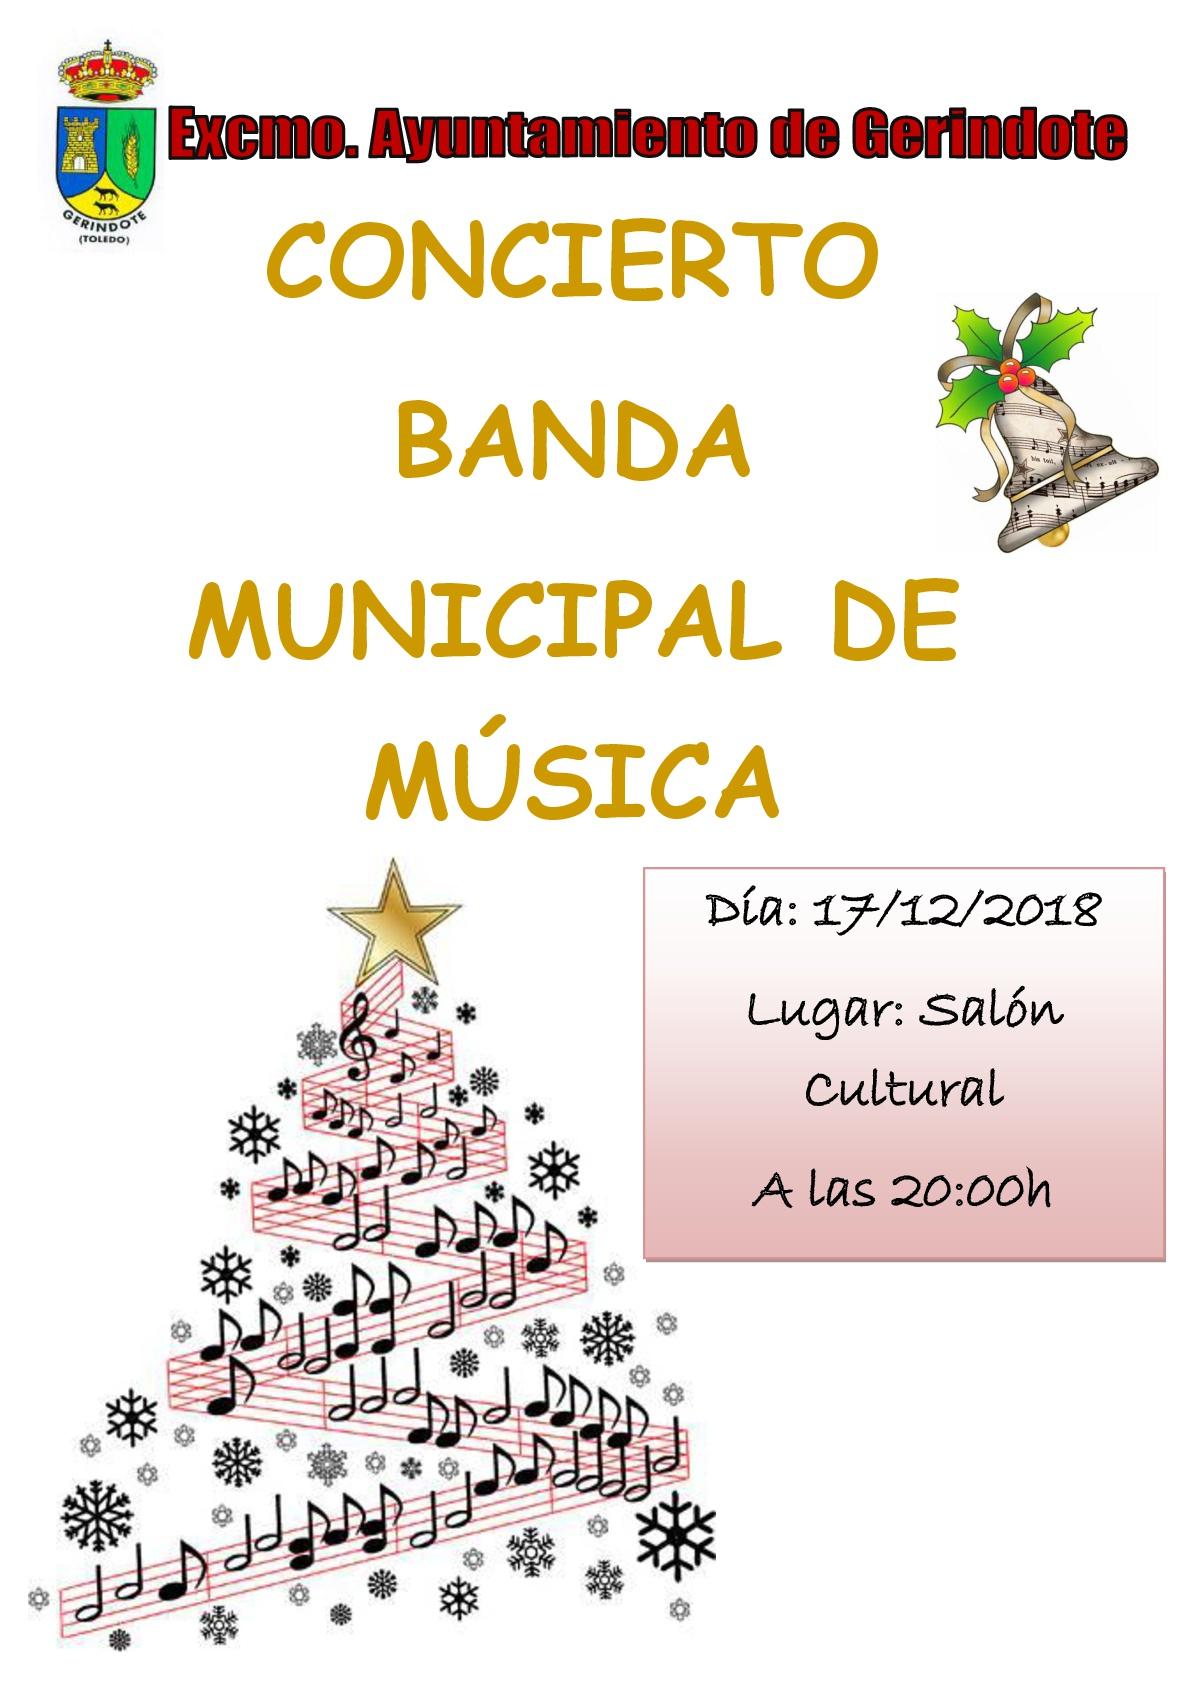 CONCIERTO BANDA MUNICIPAL-001.jpg